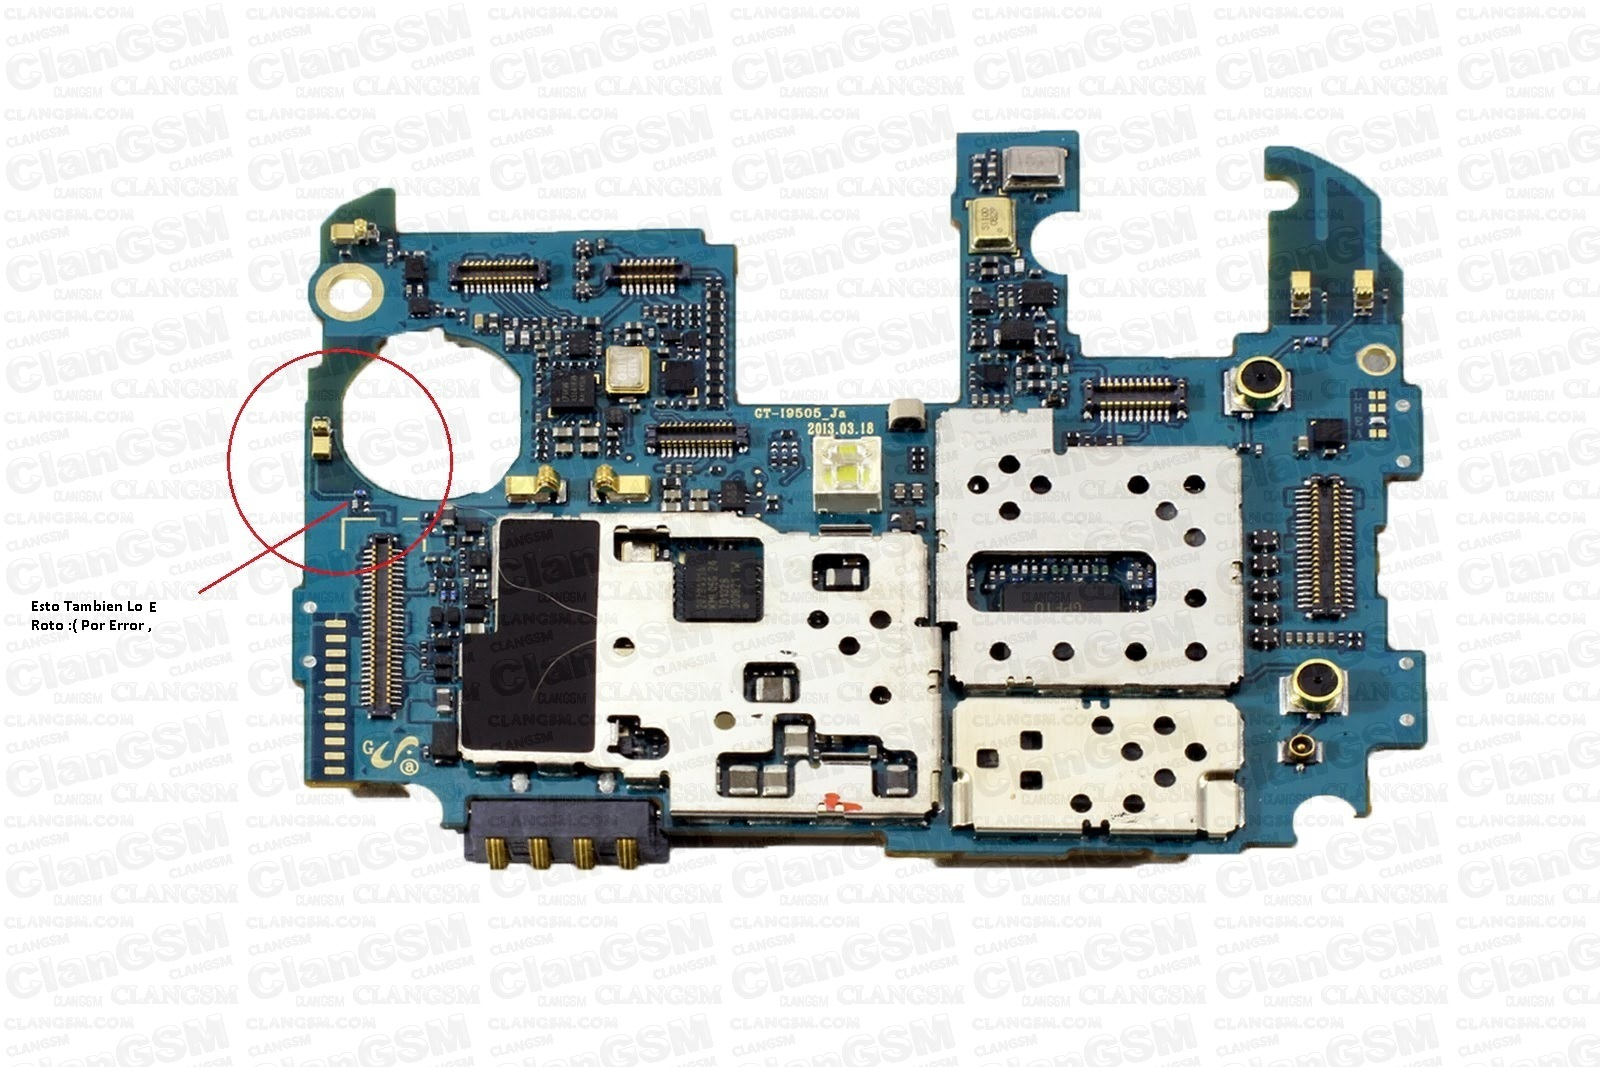 Circuito Wifi : S4 pin roto antena wifi circuito clan gsm unión de los